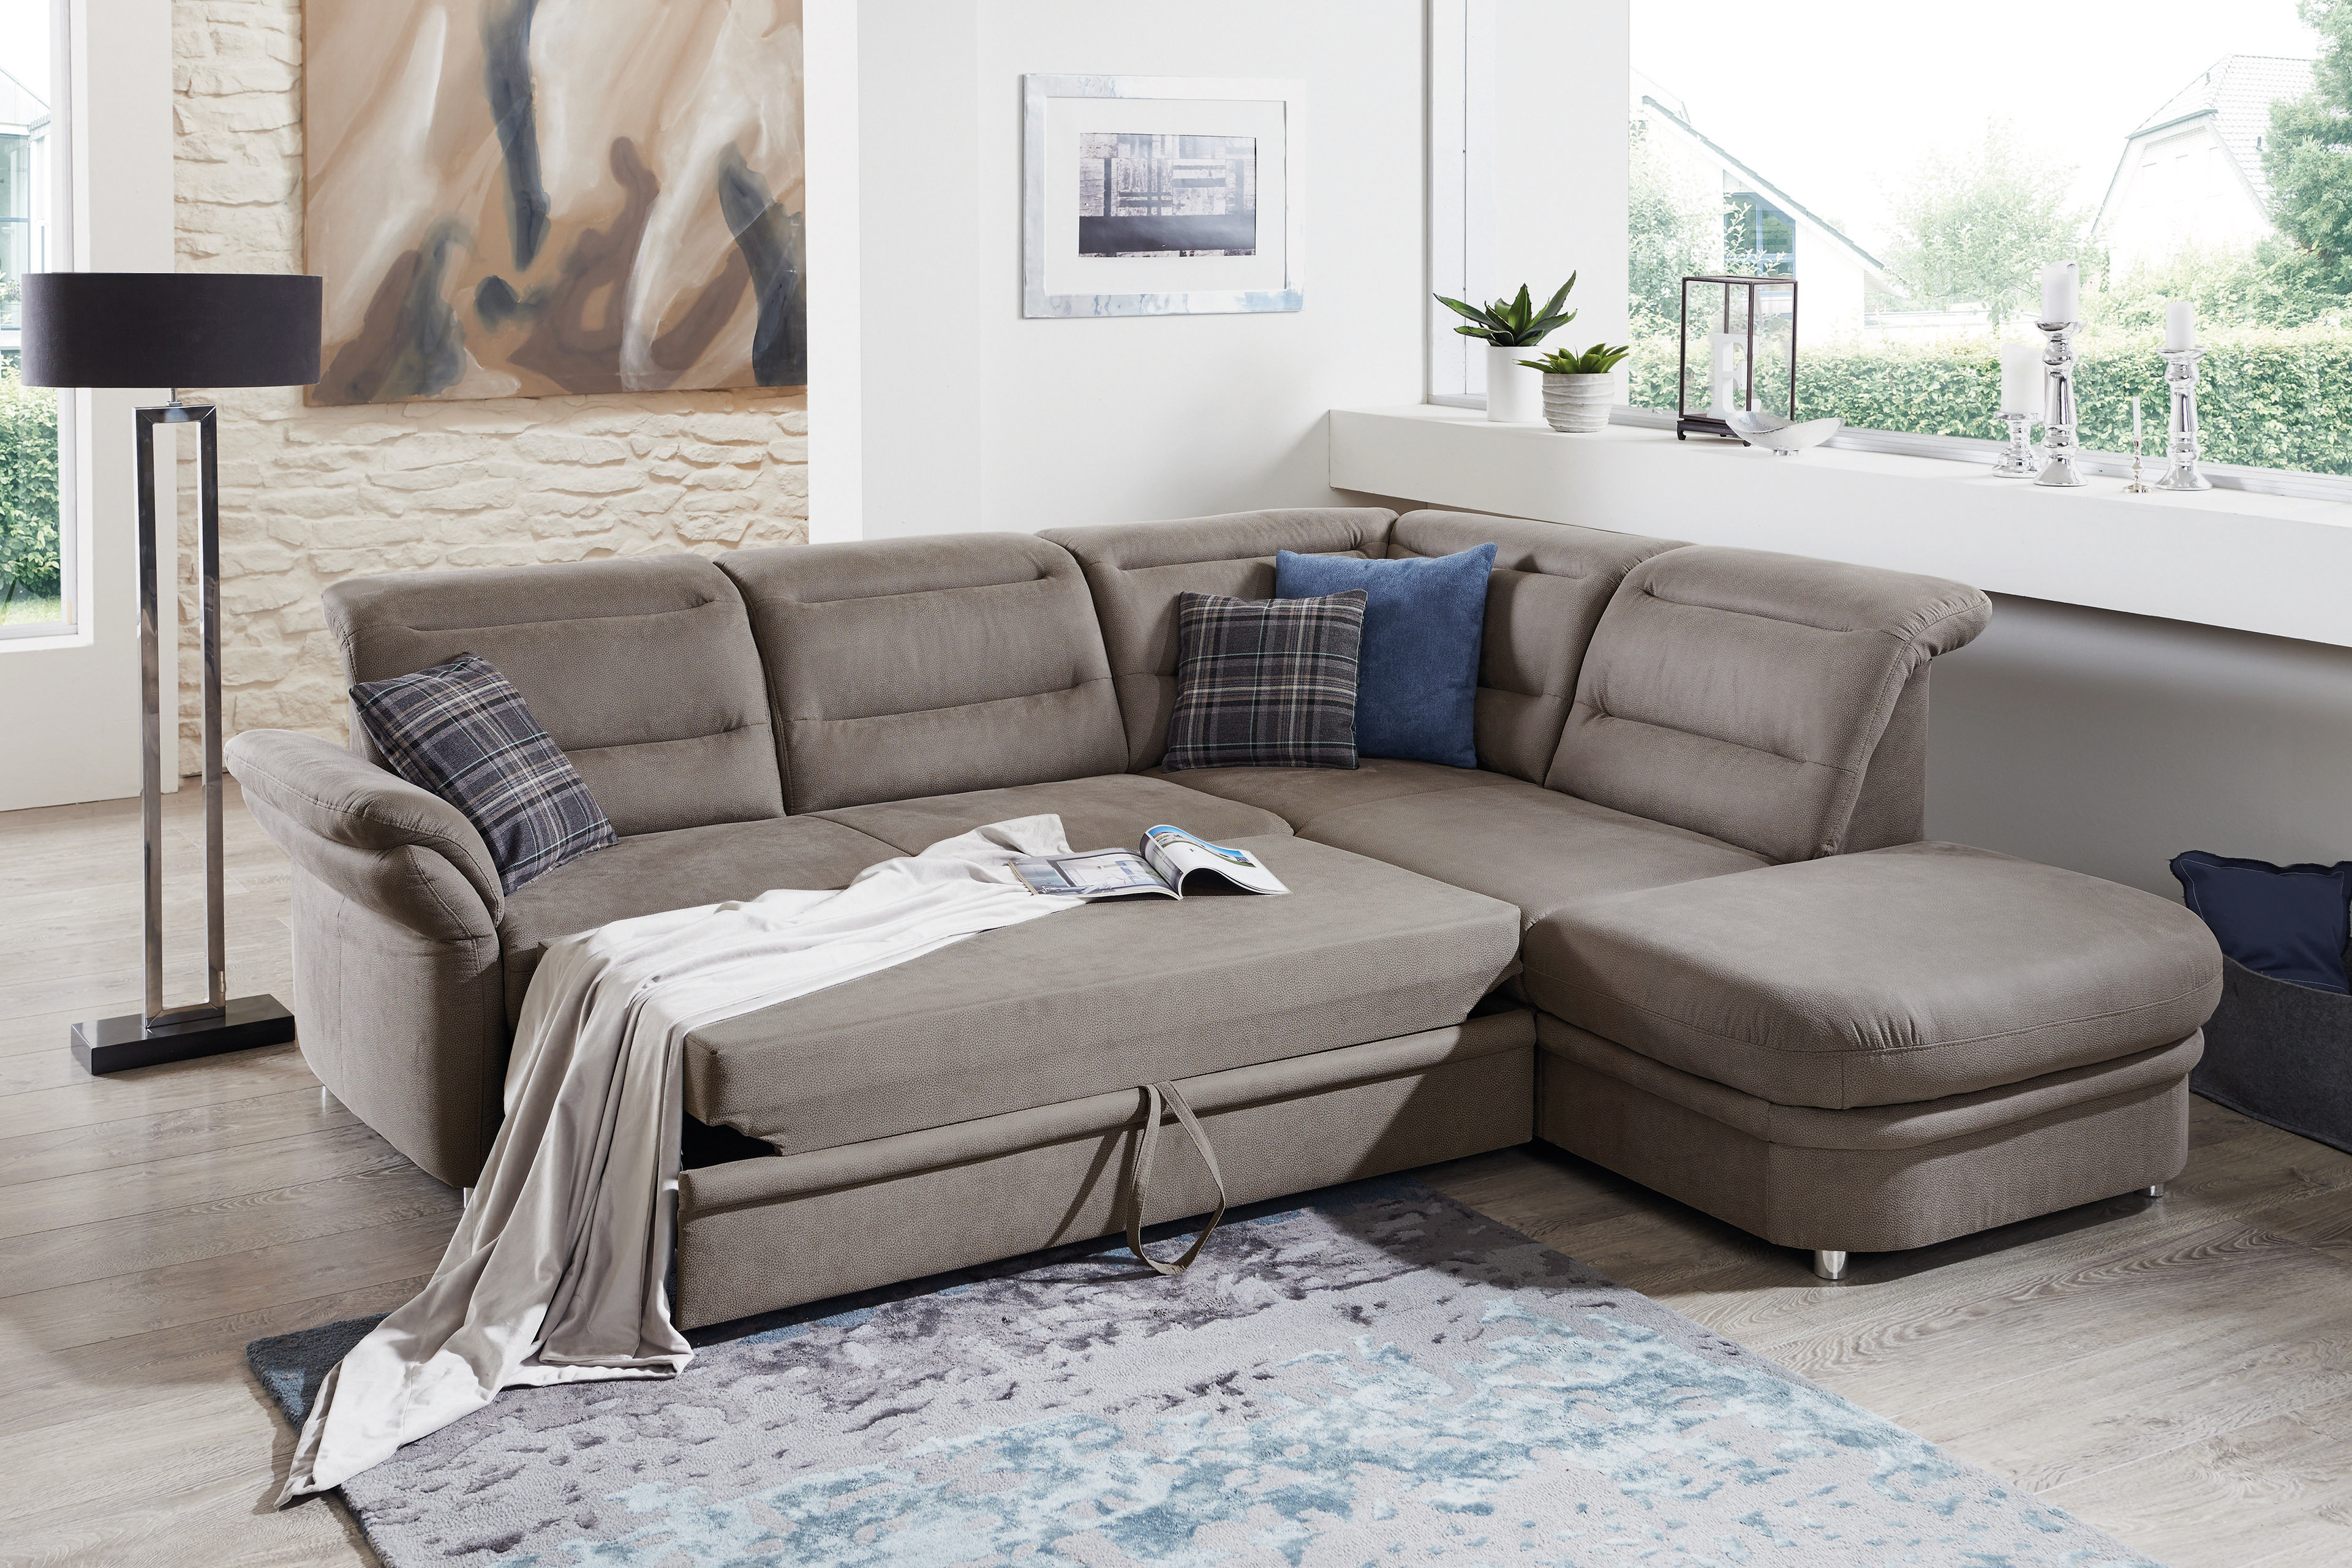 sit more bentley ecksofa braun m bel letz ihr online. Black Bedroom Furniture Sets. Home Design Ideas